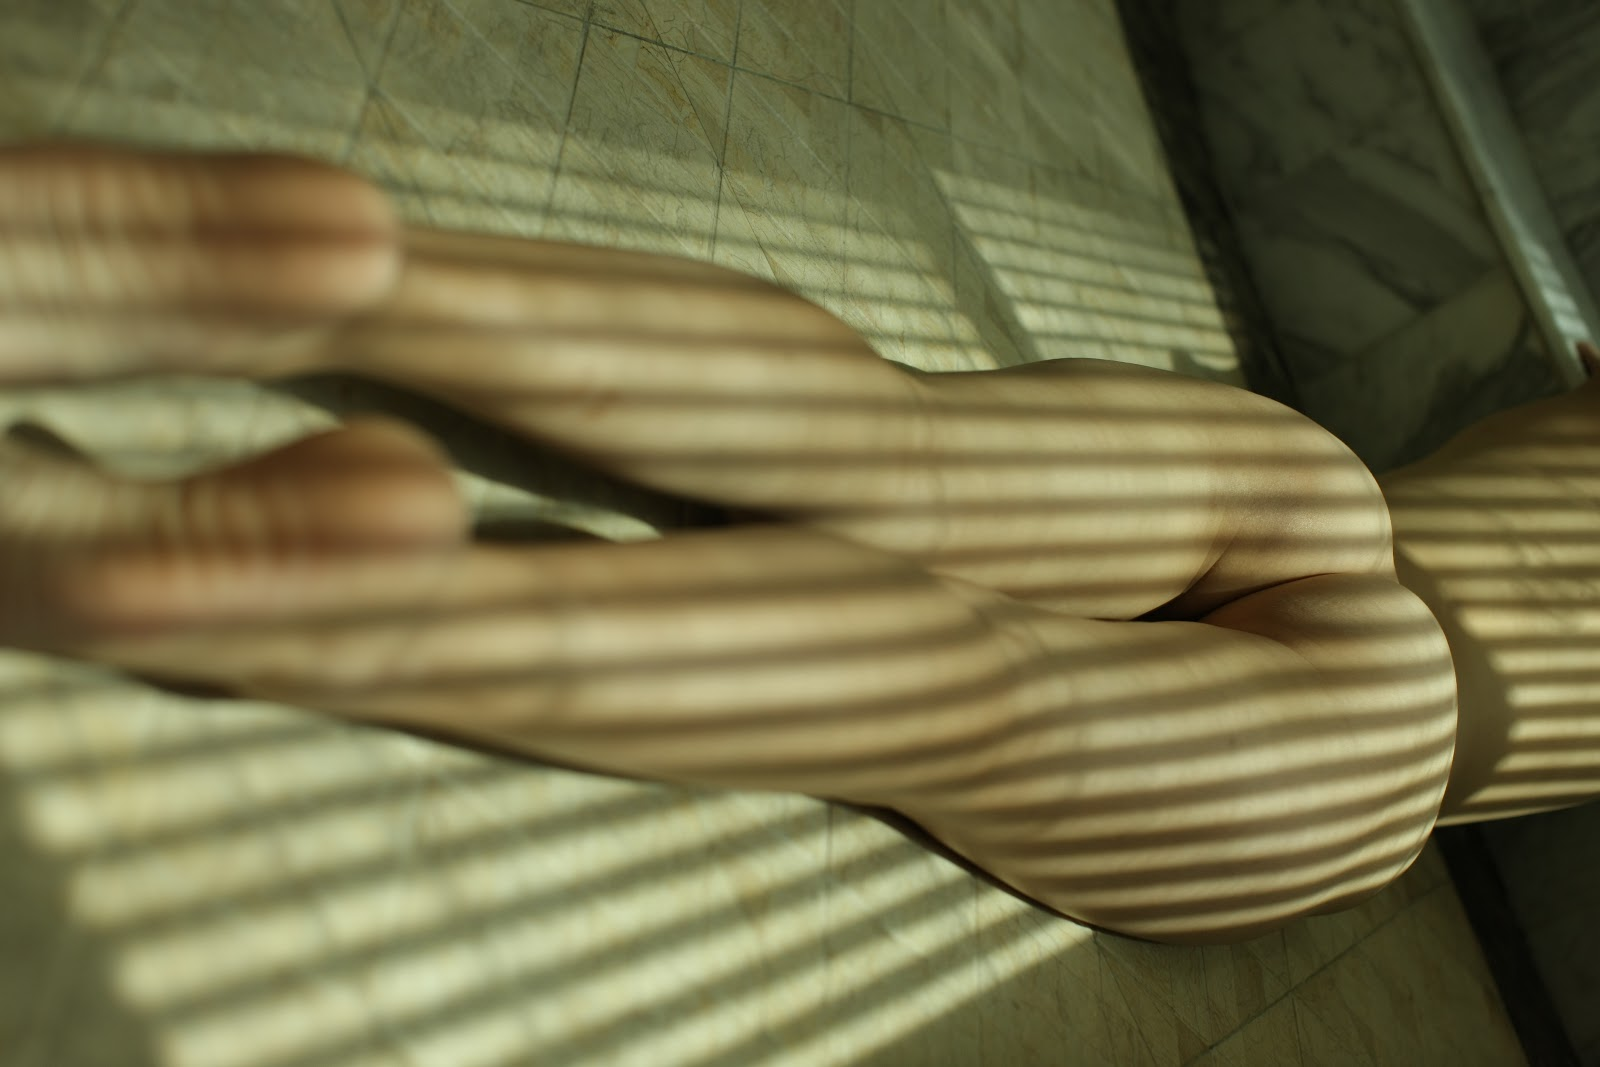 Chinese Nude_Art_Photos_-_203_-_XiangXiang_Vol_3.rar - Girlsdelta